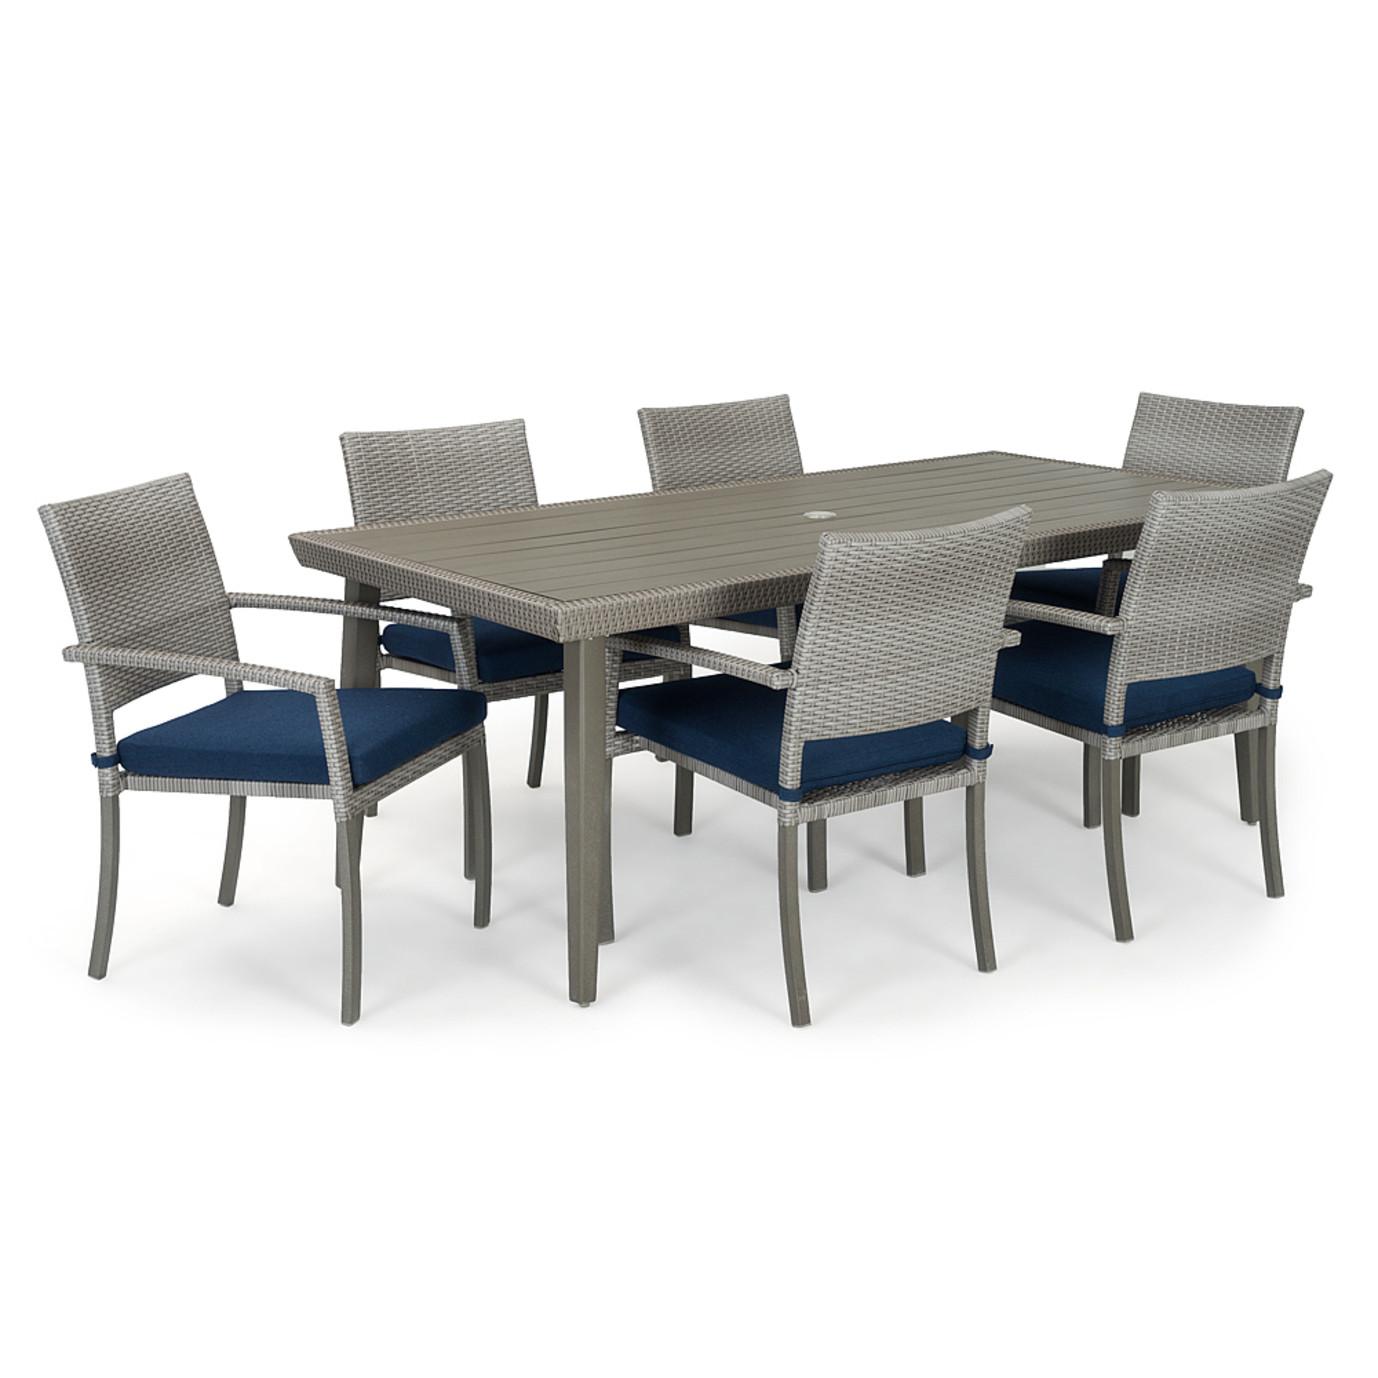 Portofino® Casual 7pc Dining Set - Laguna Blue